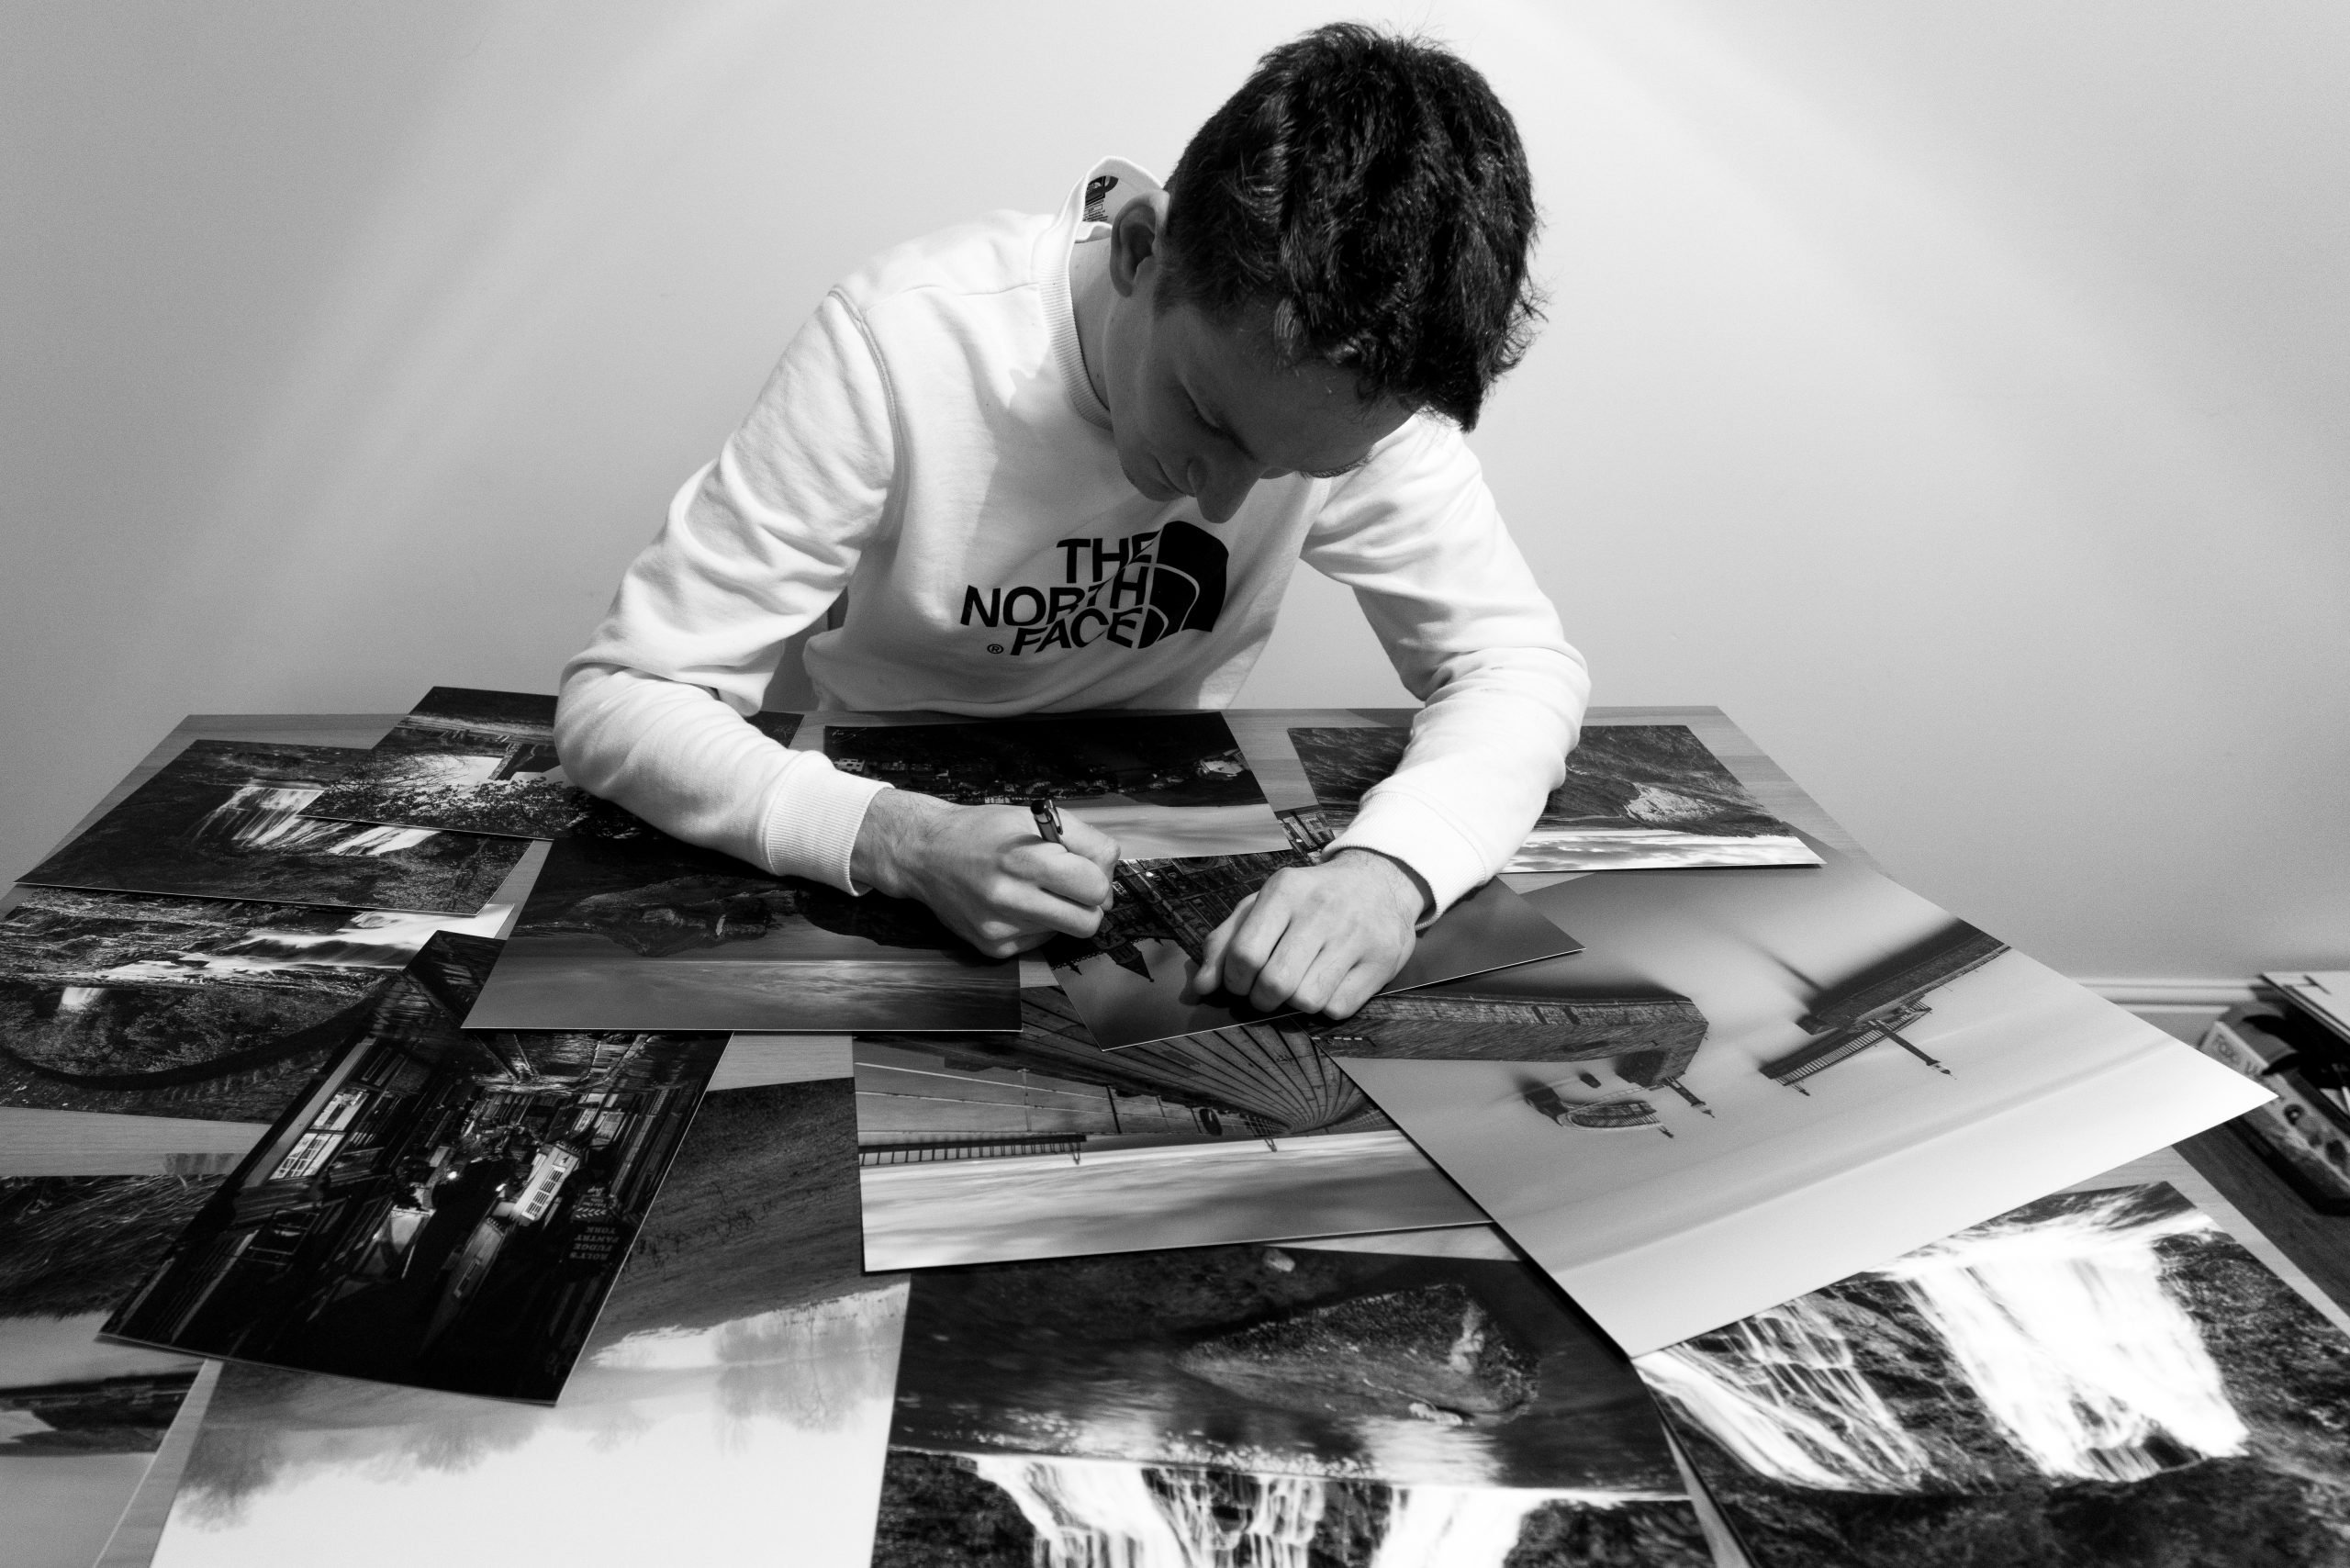 North York Photography Prints